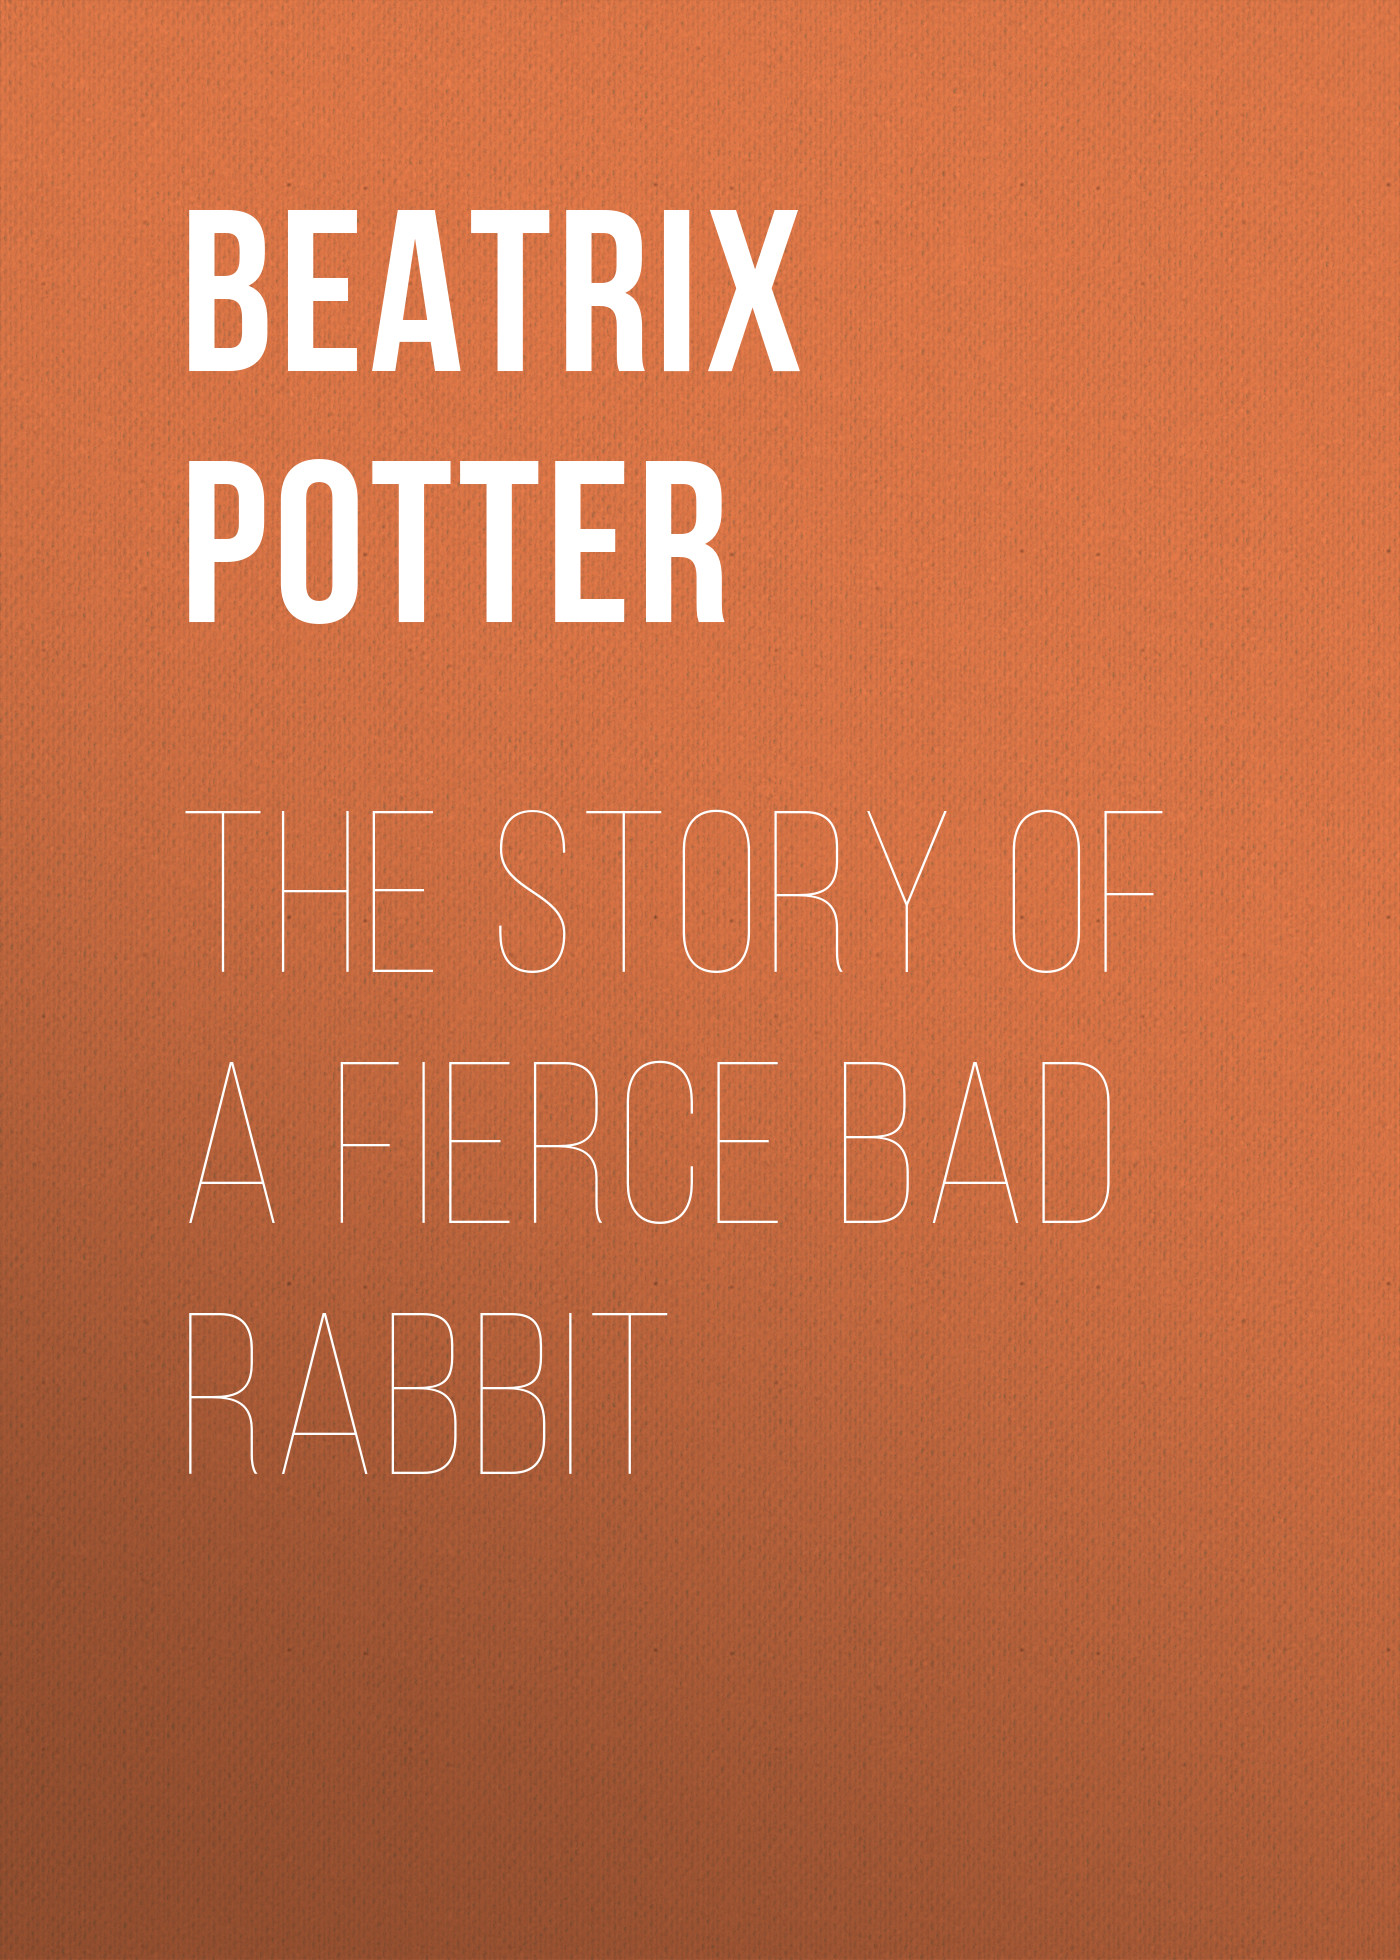 Беатрис Поттер The Story of a Fierce Bad Rabbit goodwin harold leland the wailing octopus a rick brant science adventure story